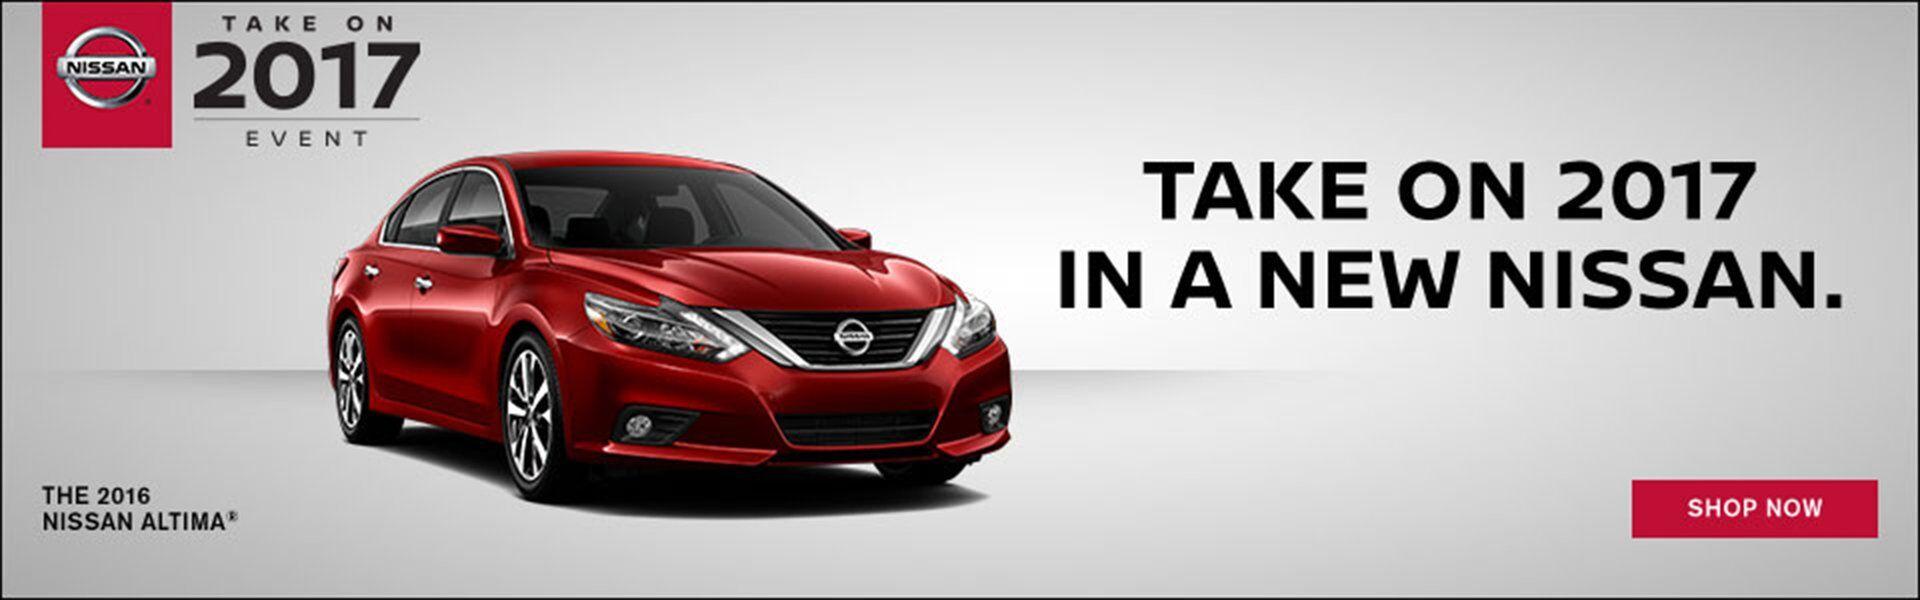 Nissan Sentra Enterprise Car Class